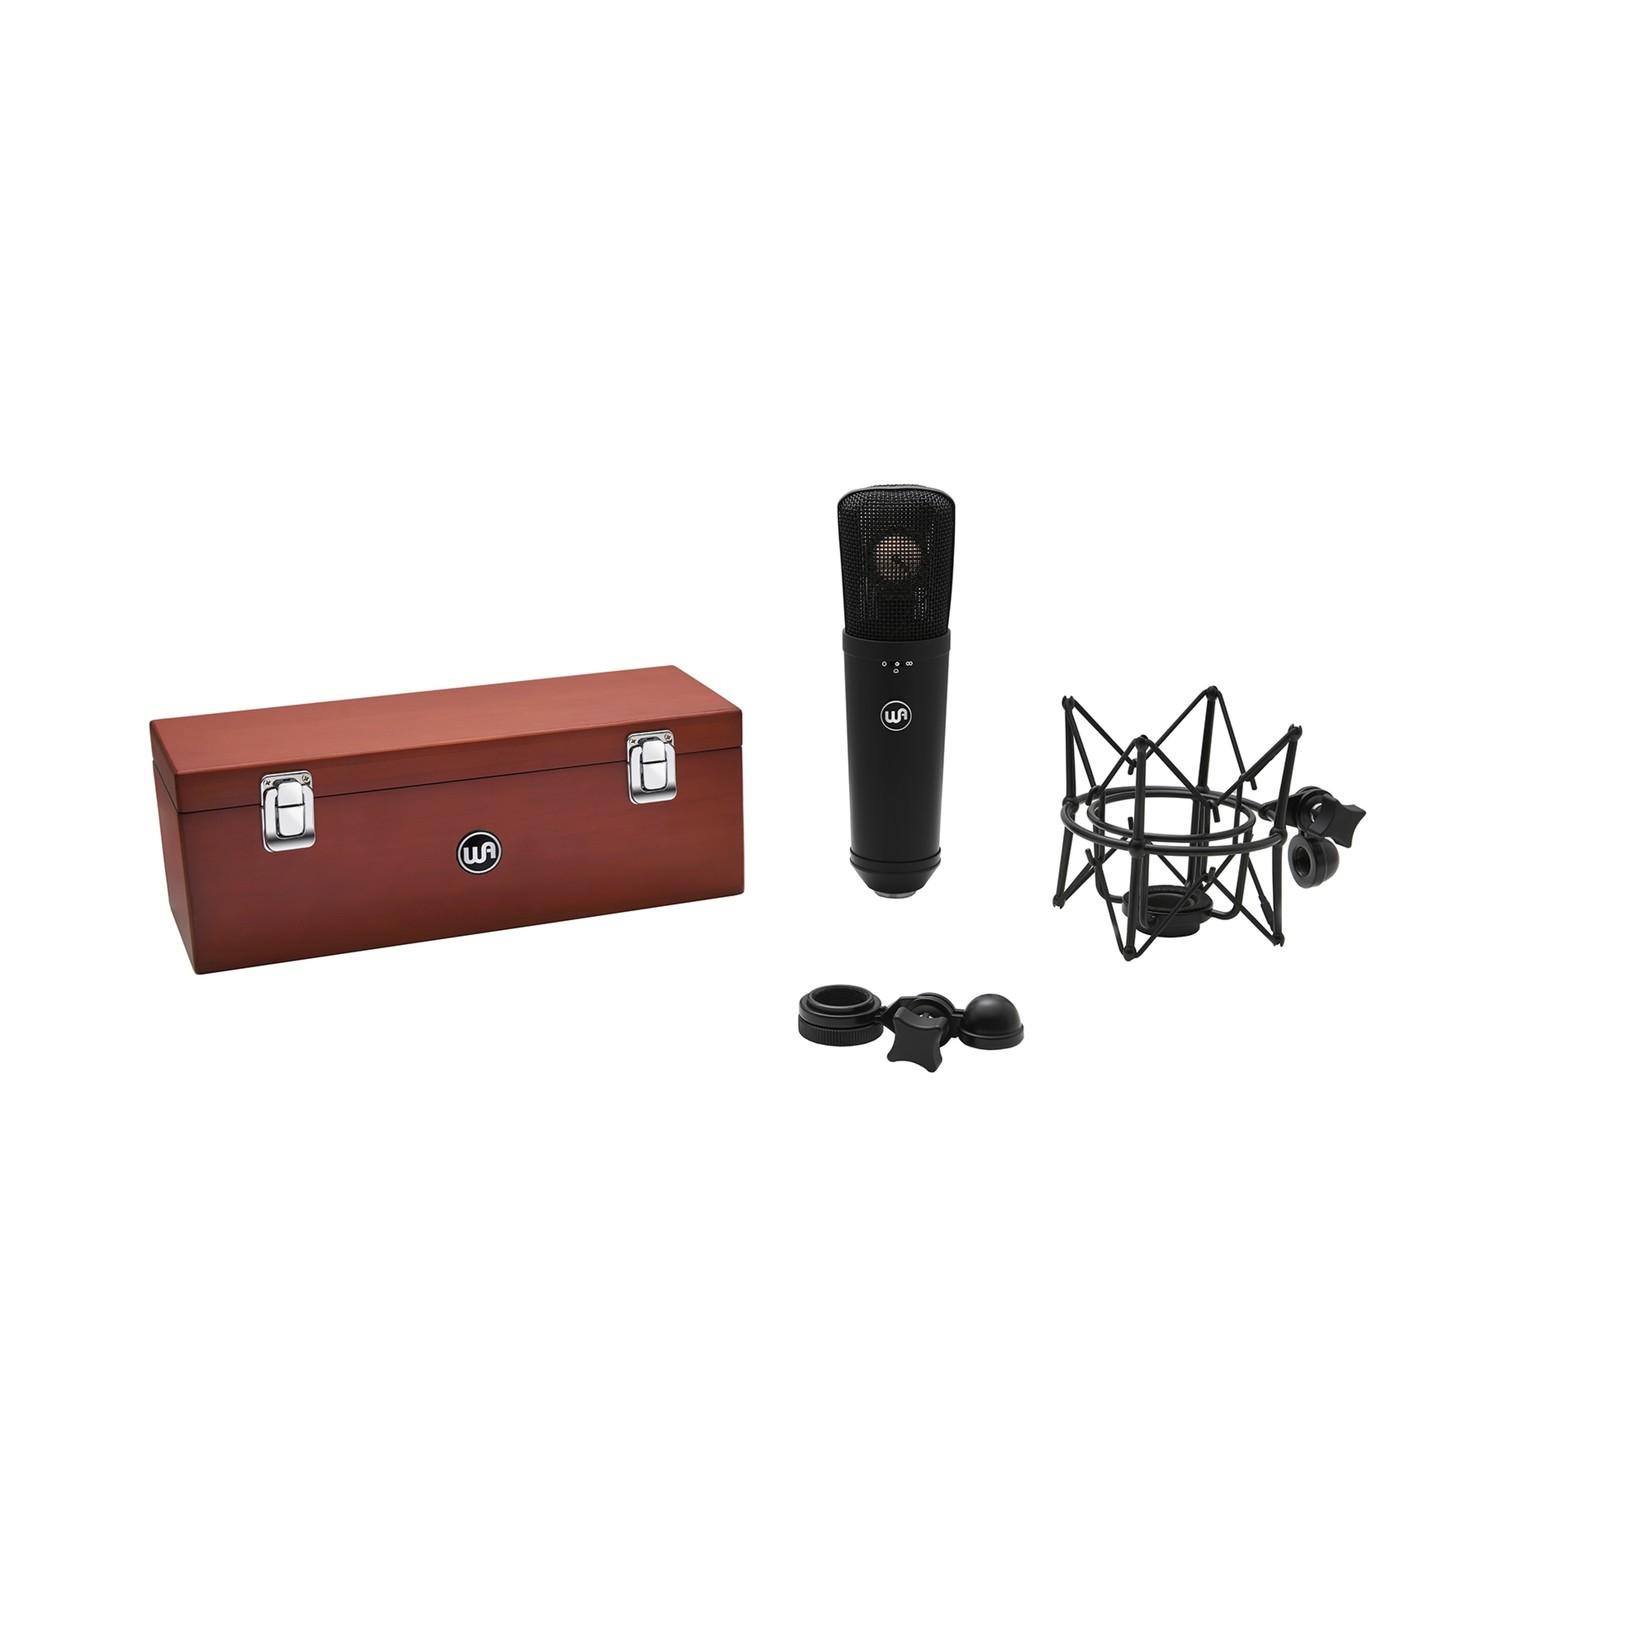 Warm Audio Warm Audio WA-87 R2 FET Condenser Microphone, Black - with Shockmount, Hardmount, and Wood Box